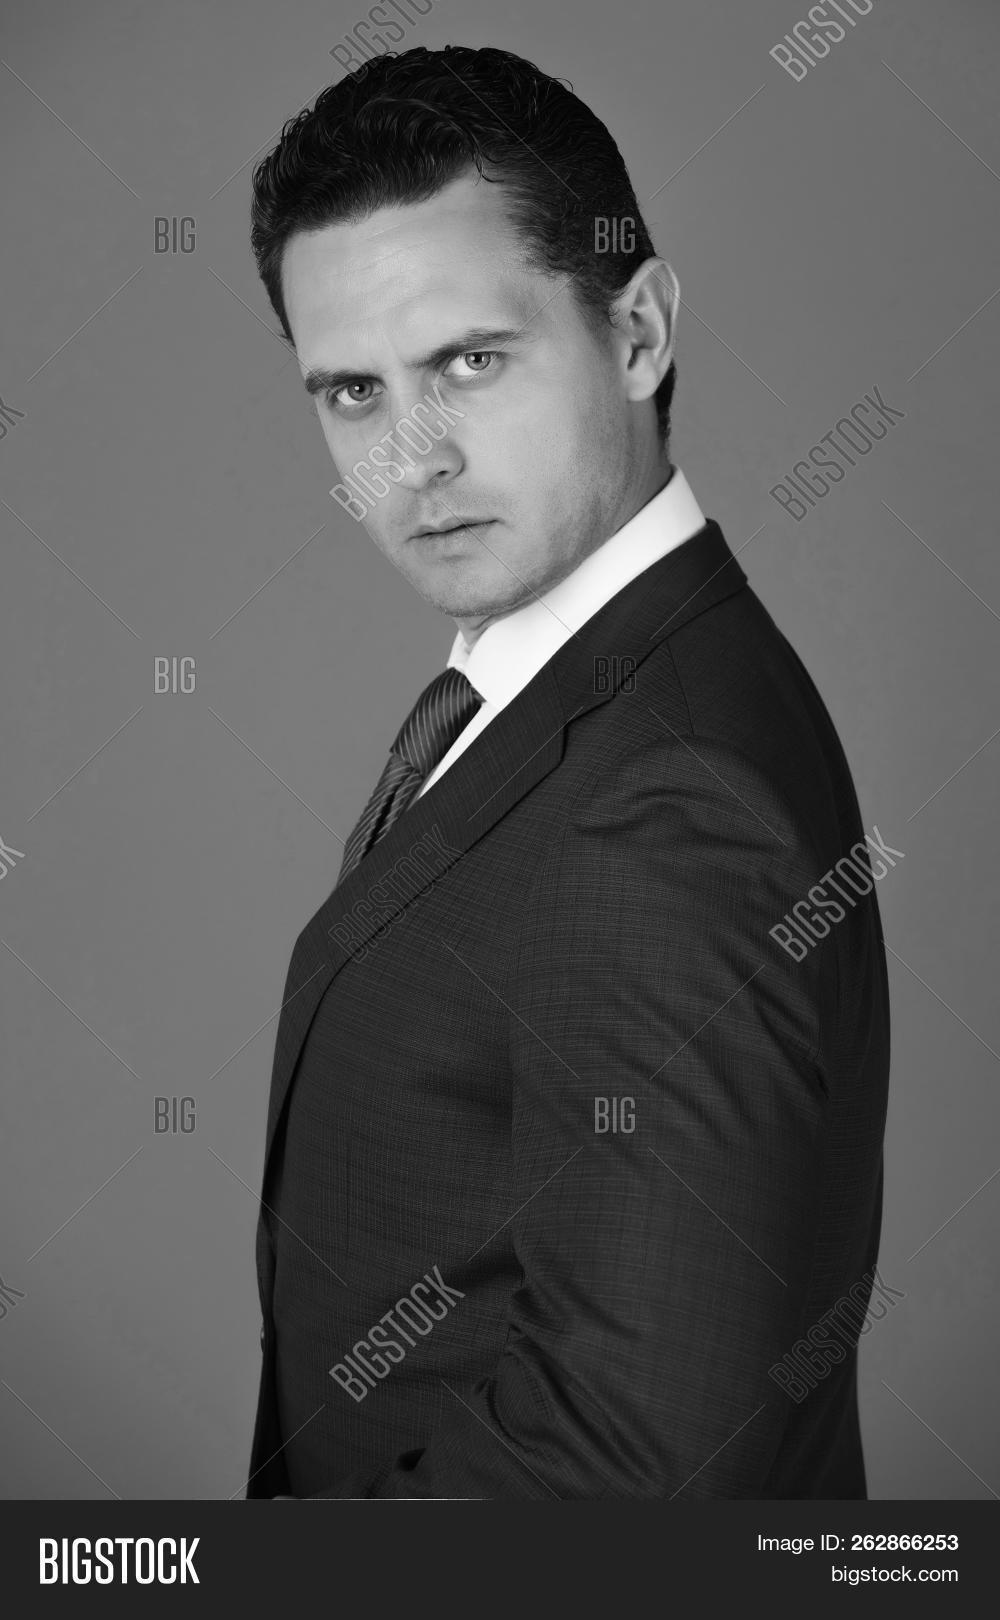 businessman handsome image photo